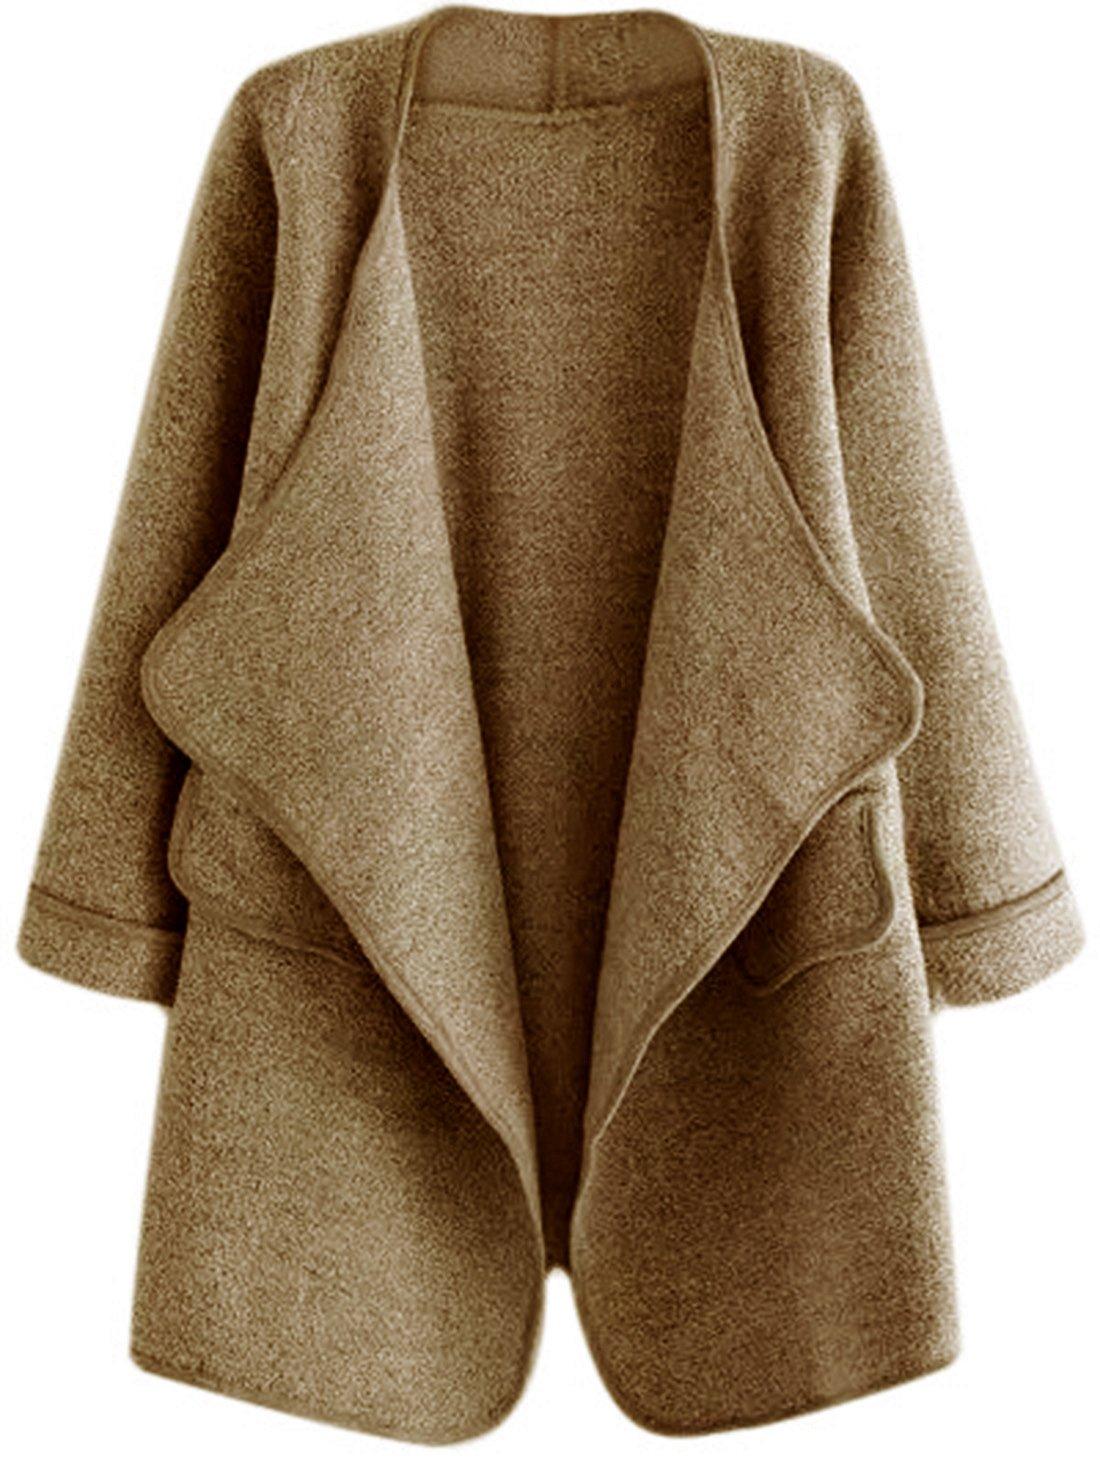 SheIn Women's Long Sleeve Cardigan Open Front Loose Sweater Coat One-Size Khaki